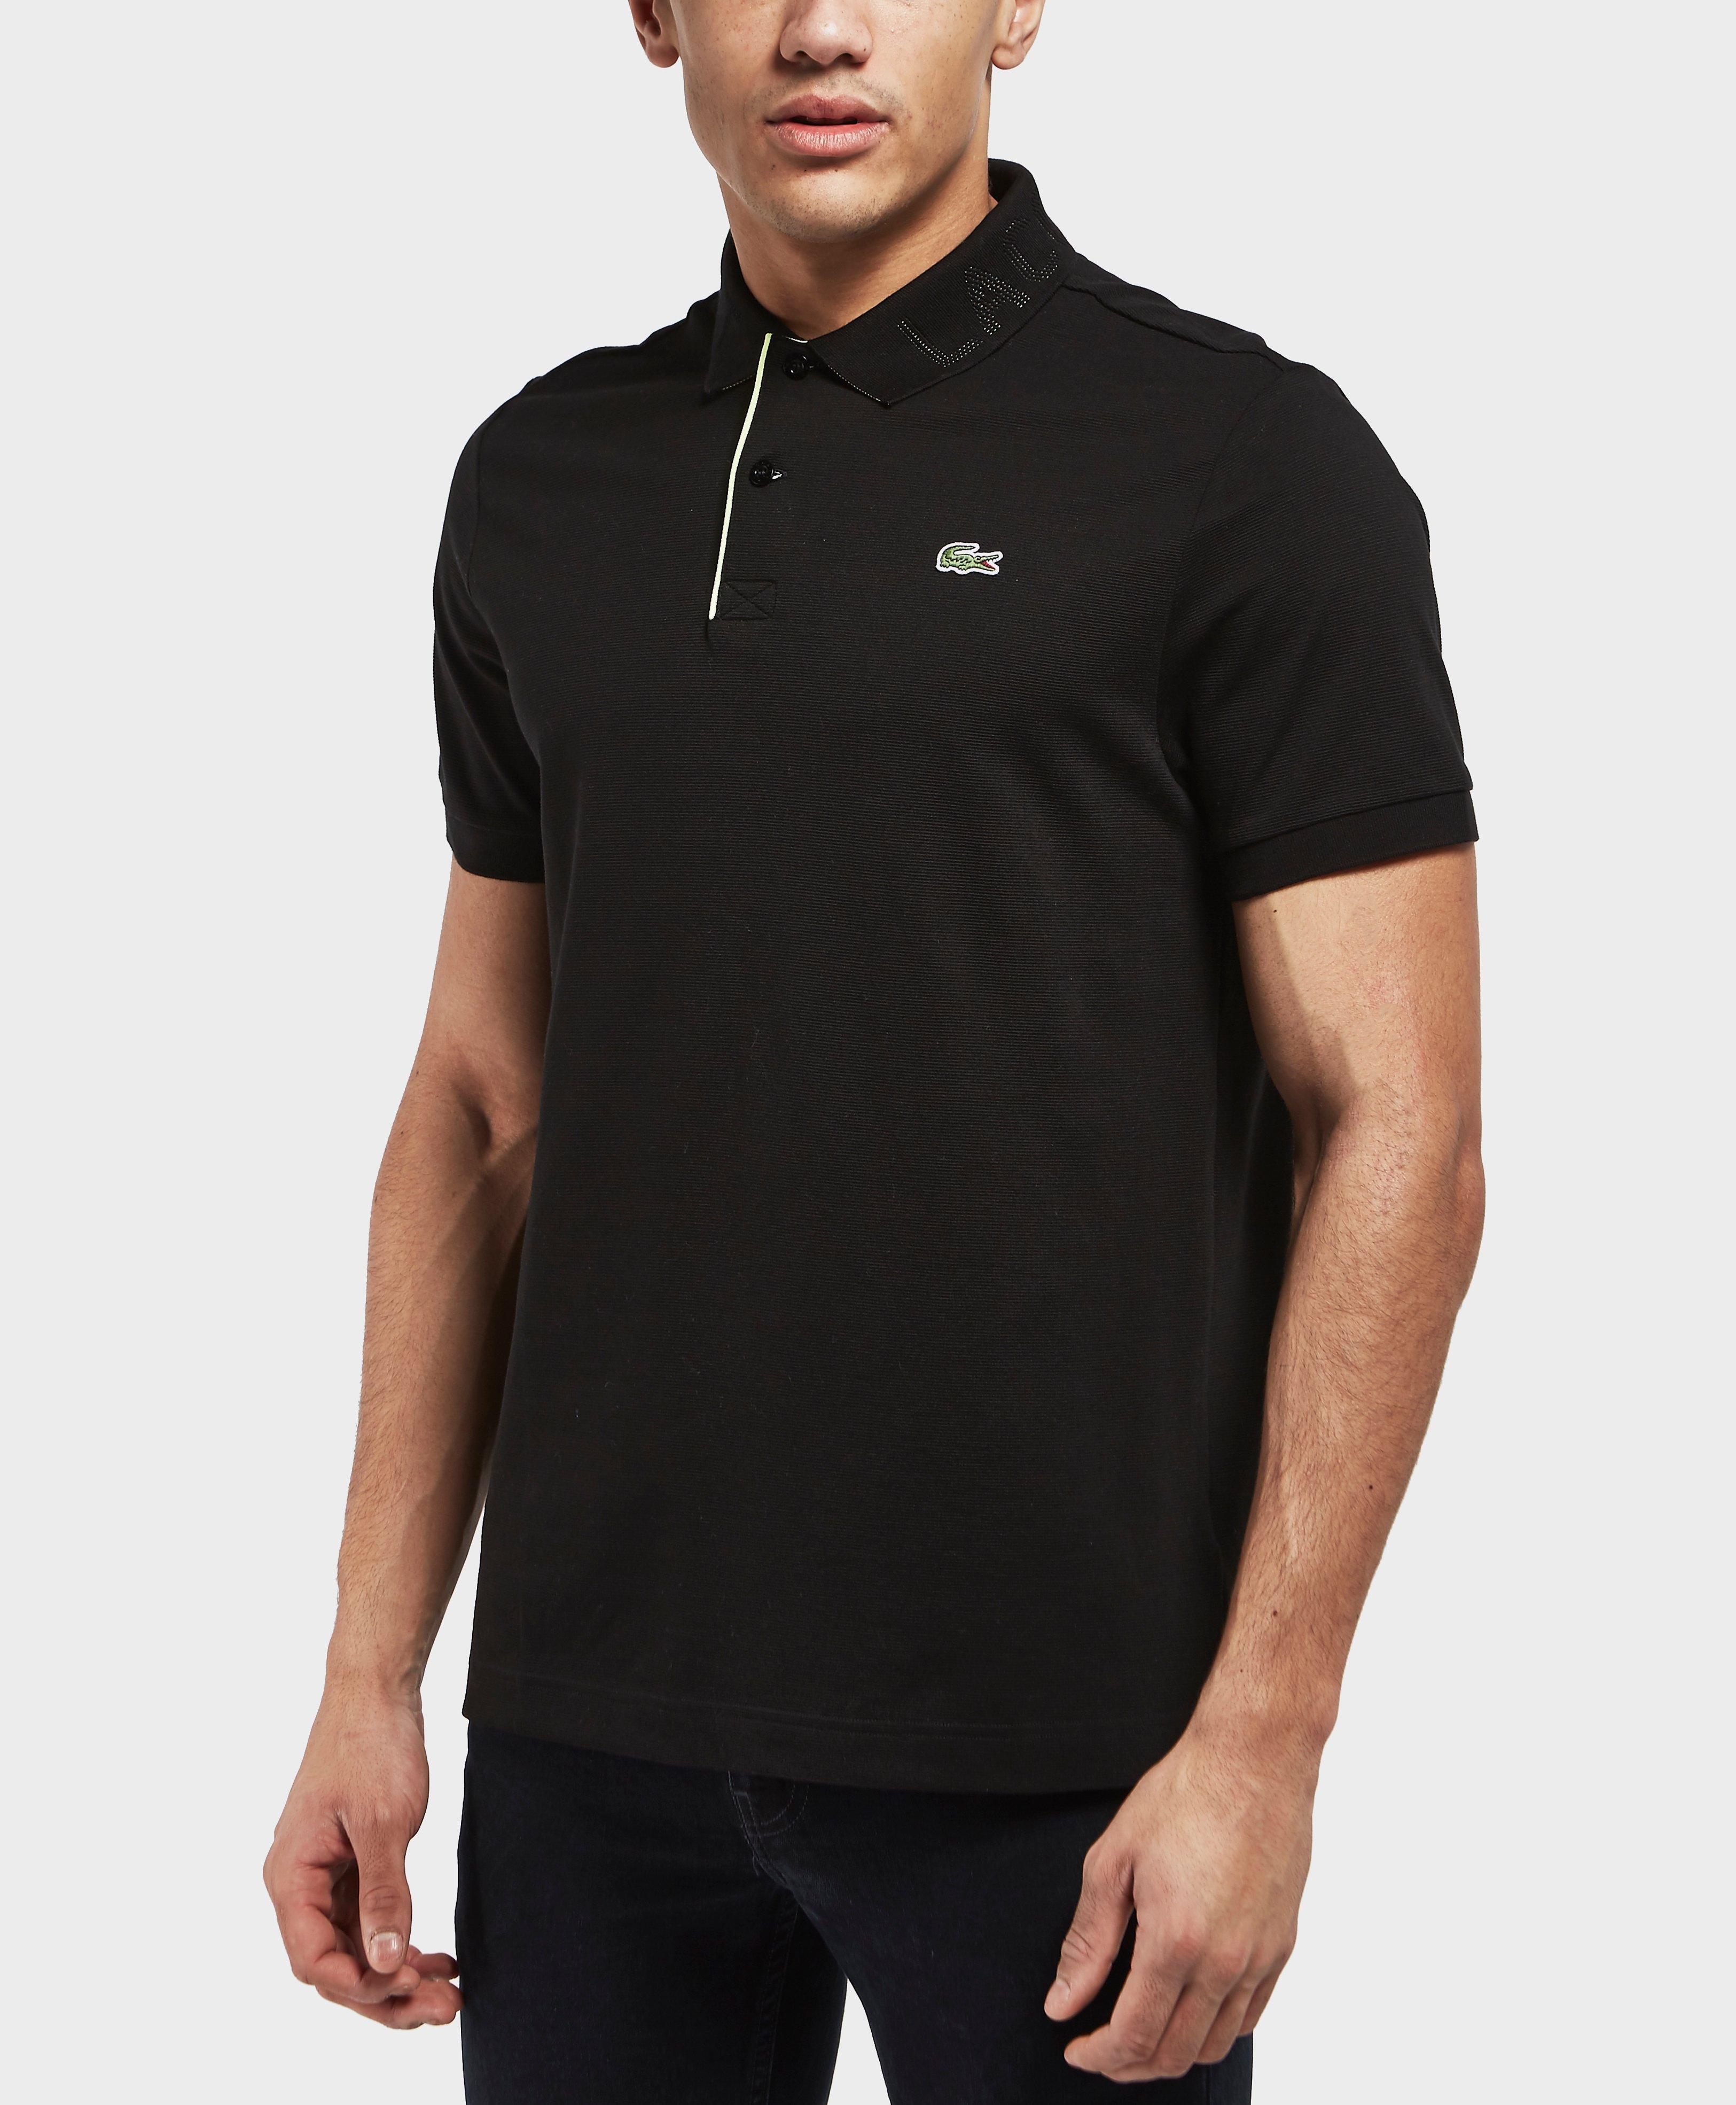 Lyst lacoste logo collar short sleeve polo shirt in for Short sleeve lacoste shirt